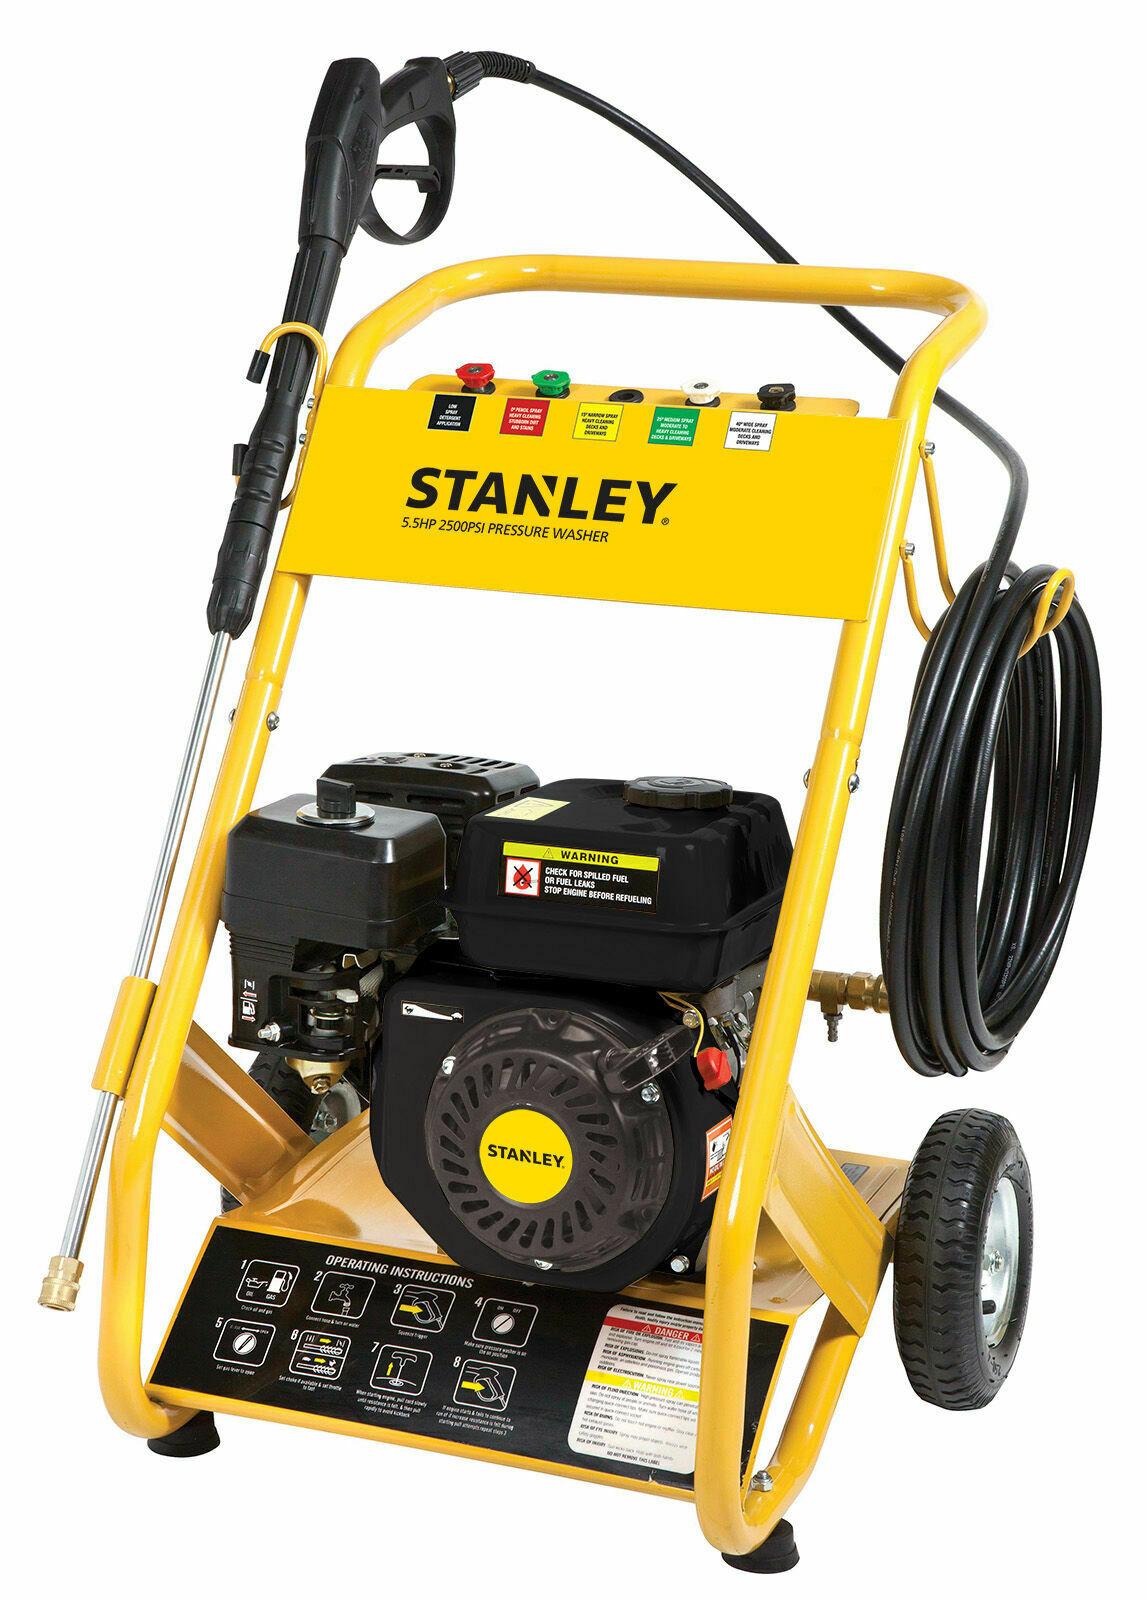 [Price Error] Stanley Petrol Pressure Washer - 5.5HP, 2500 PSI